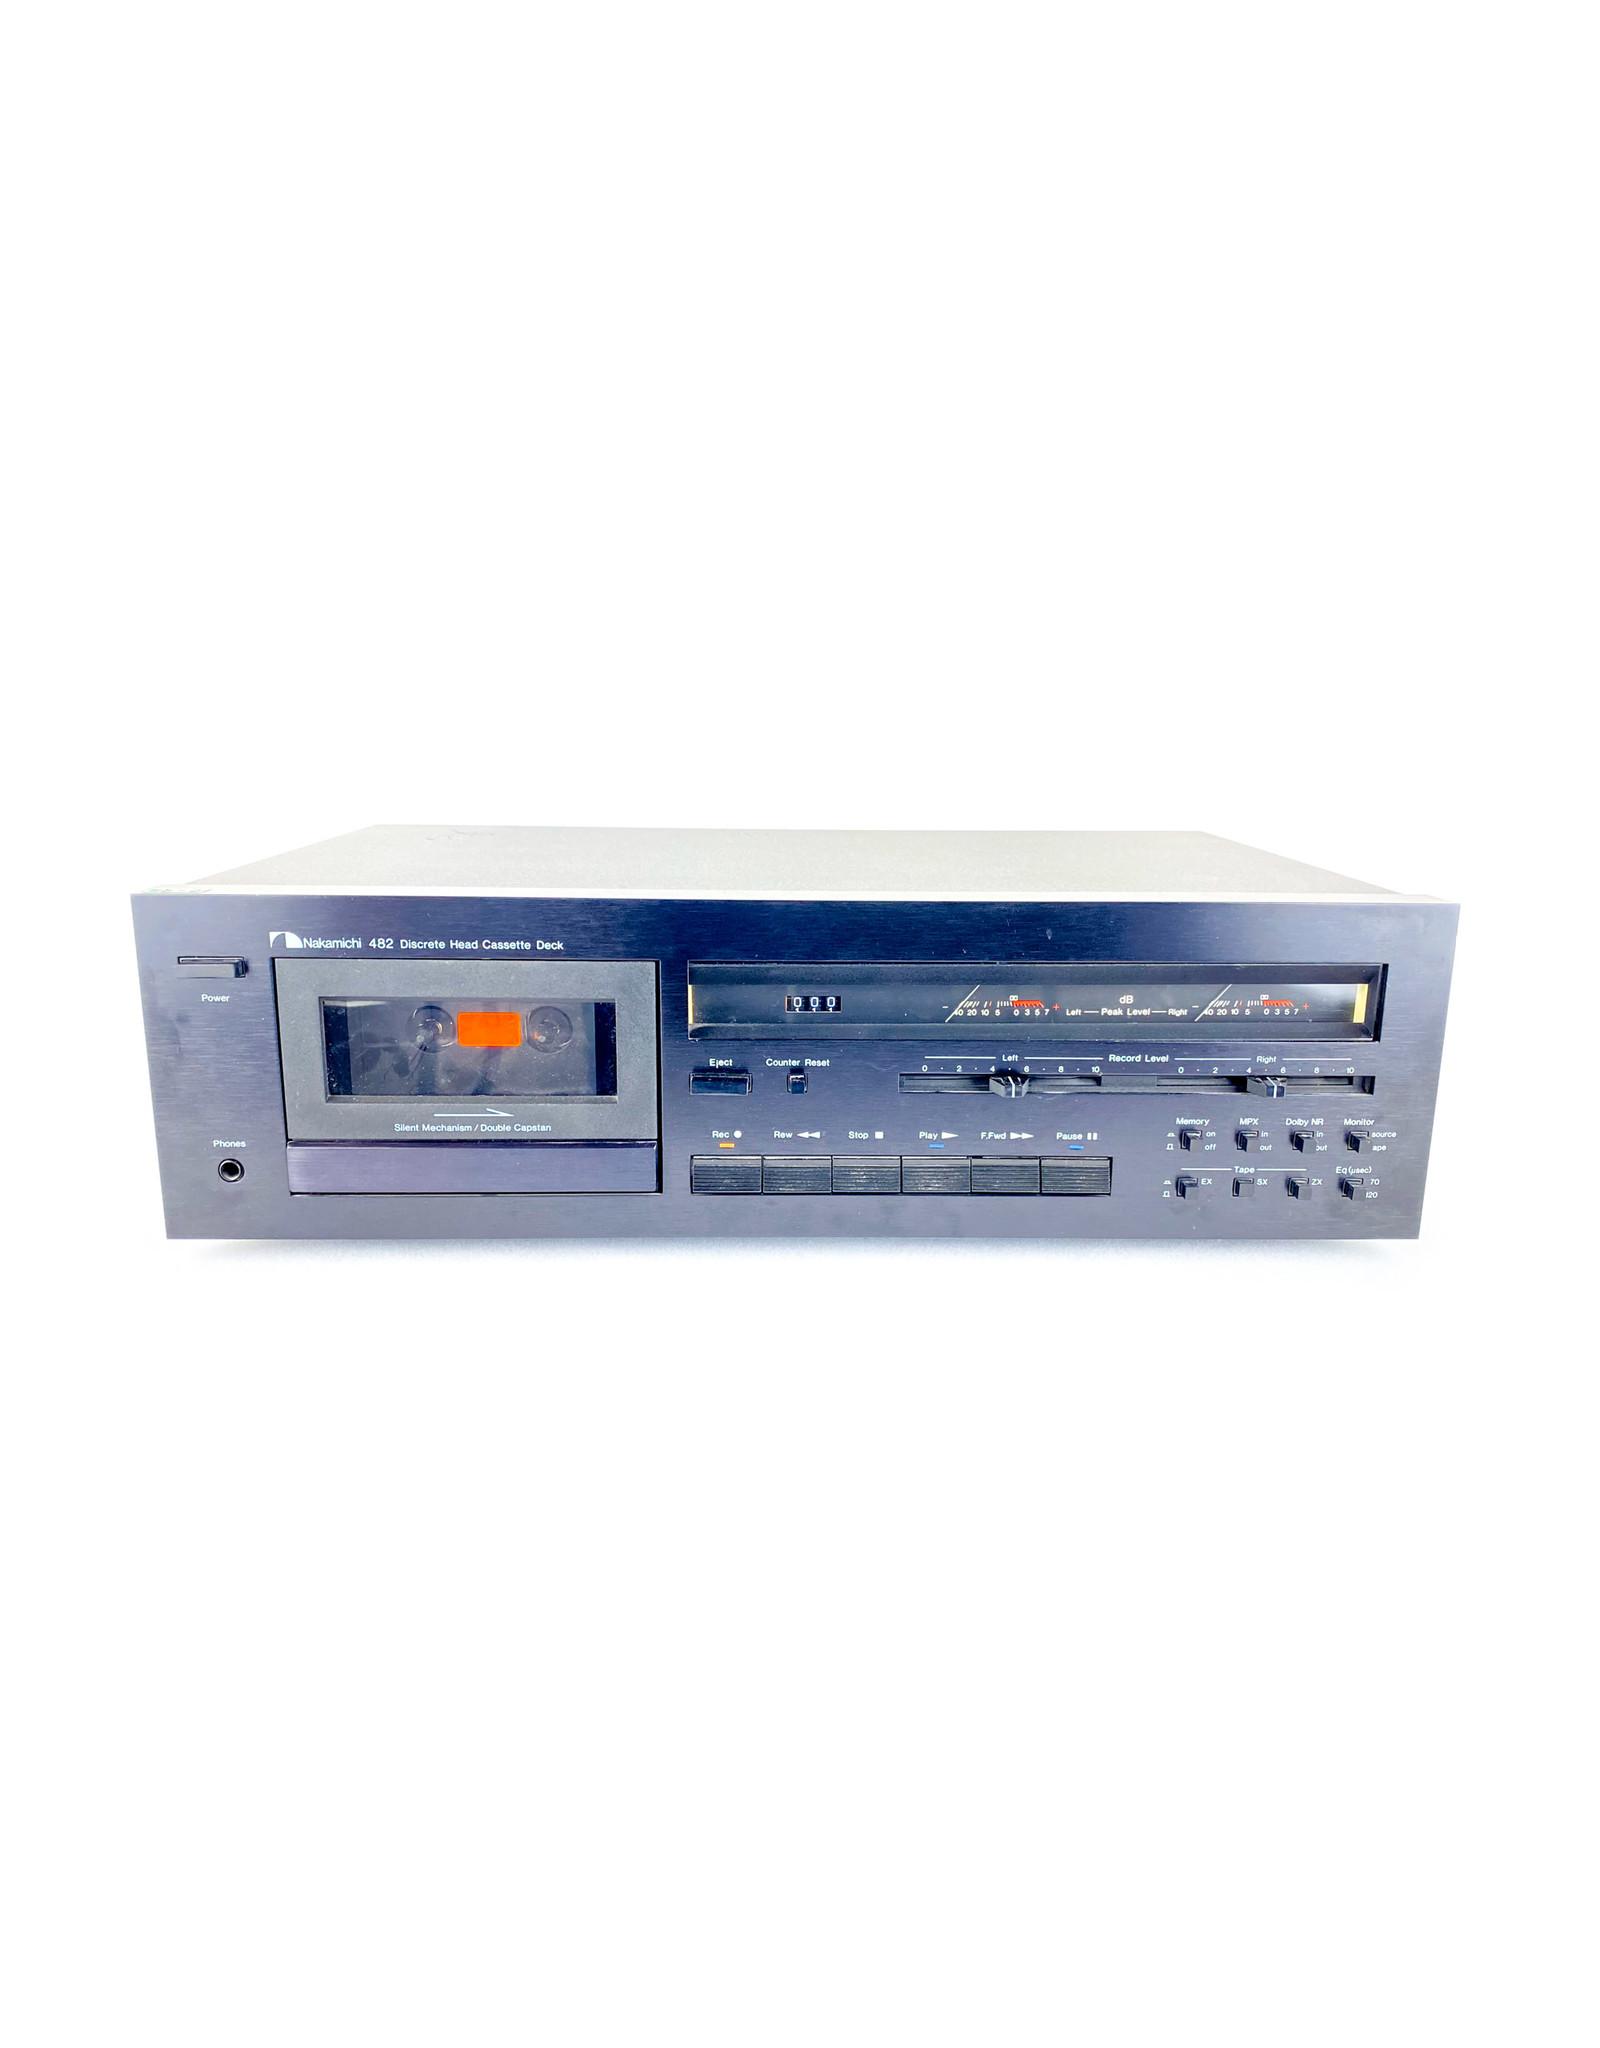 Nakamichi Nakamichi 482 Cassette Deck USED